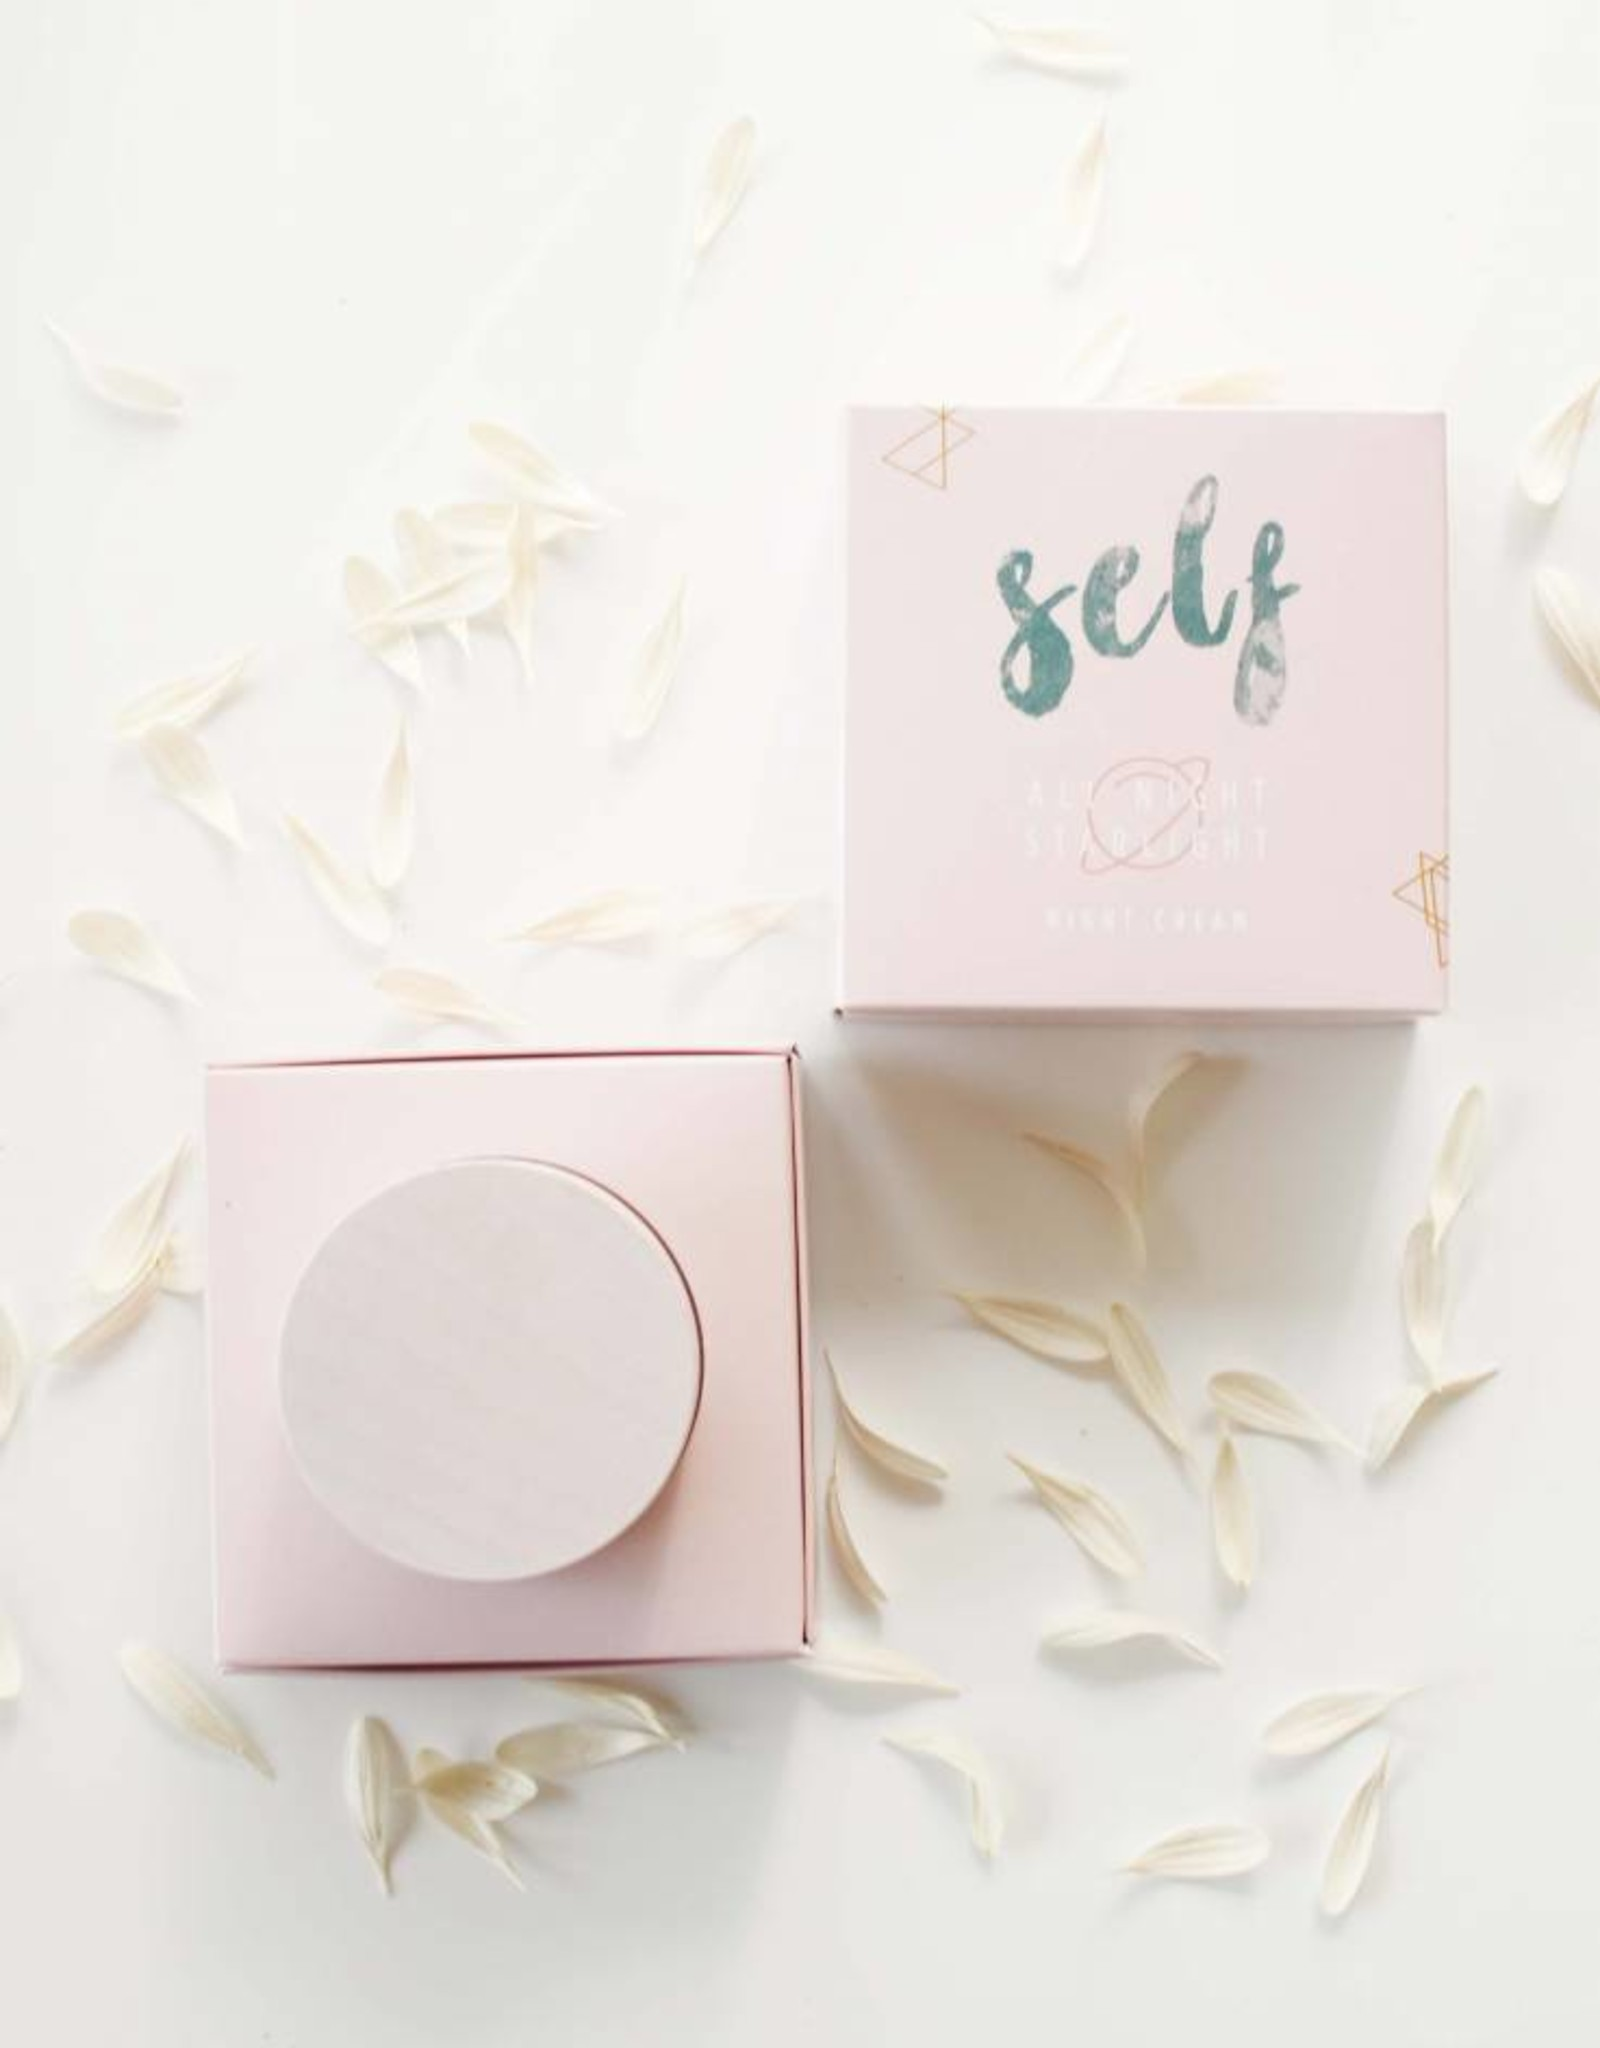 Self Self - Night cream